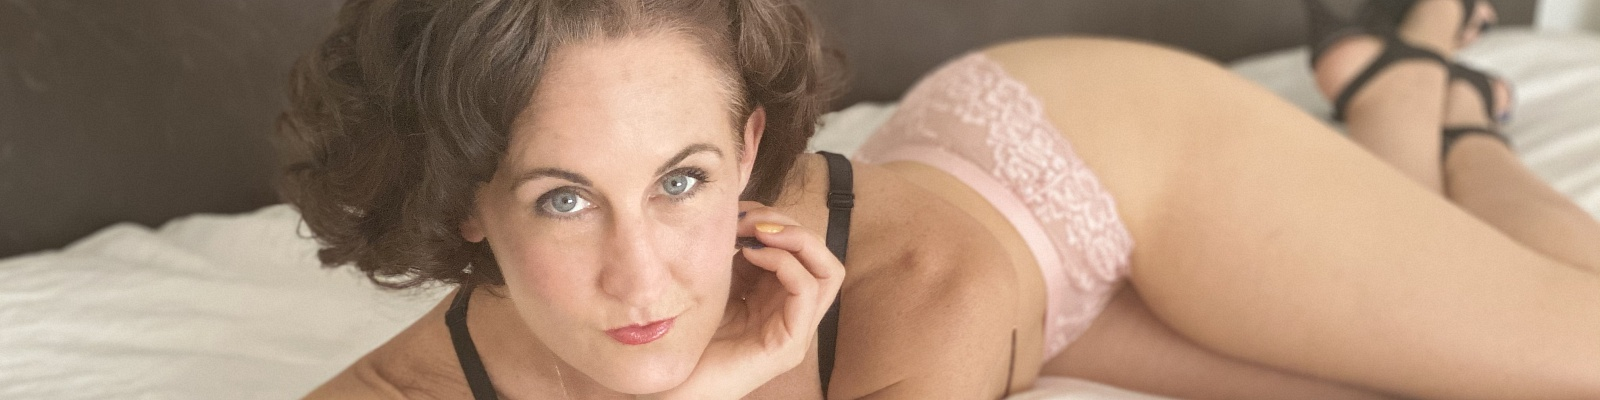 Margot Deveraux's Cover Photo